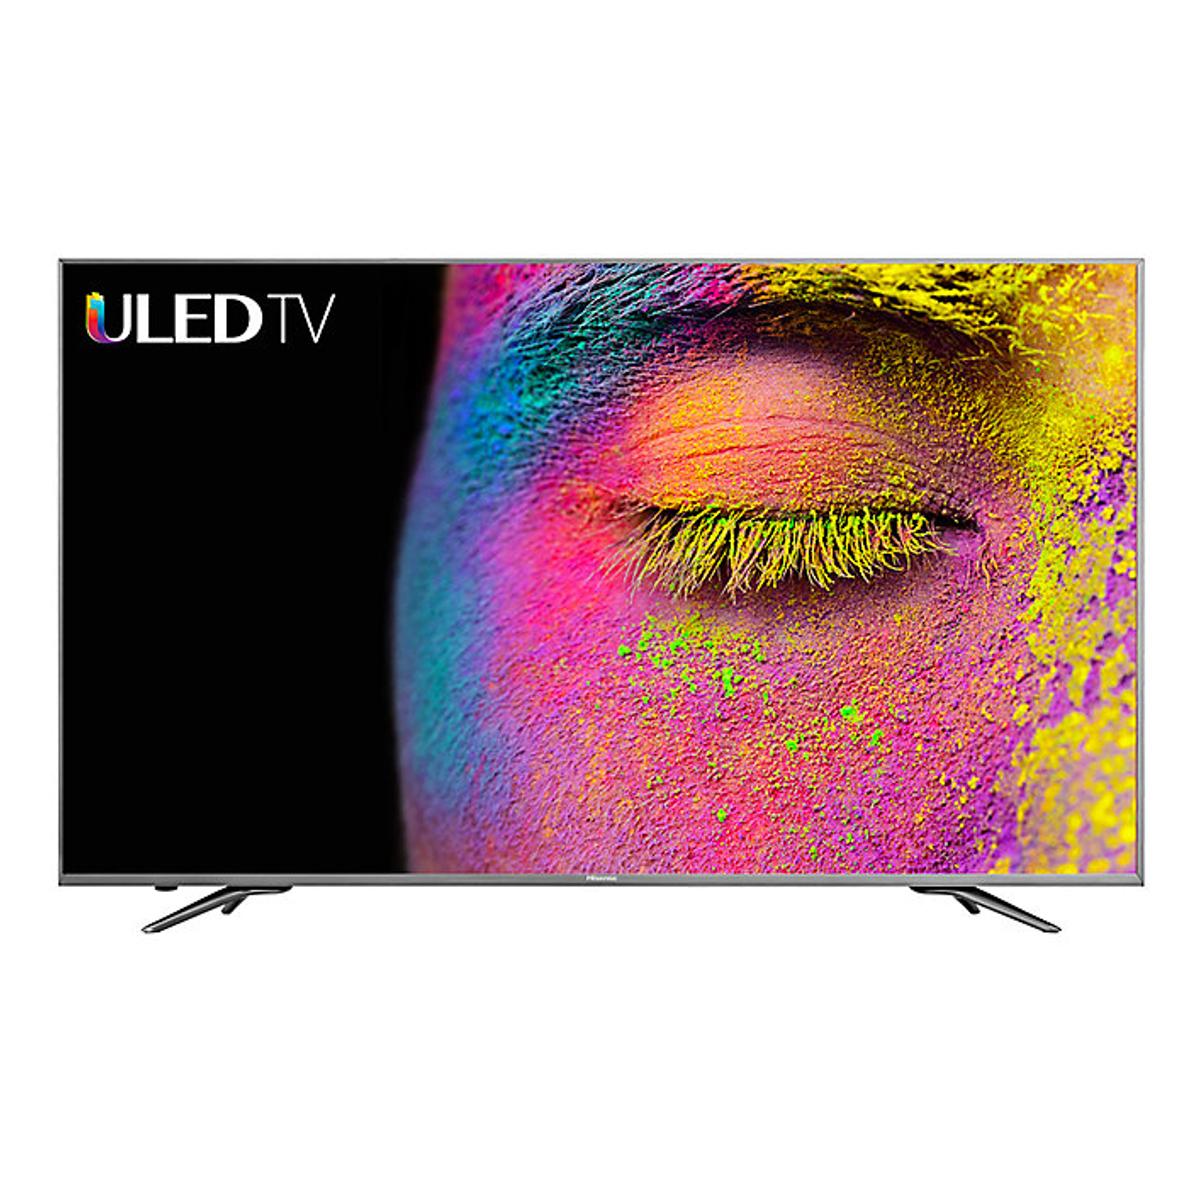 "Hisense H65N6800 65"" 4K HDR Smart Tv £829.00 Hughes with code"